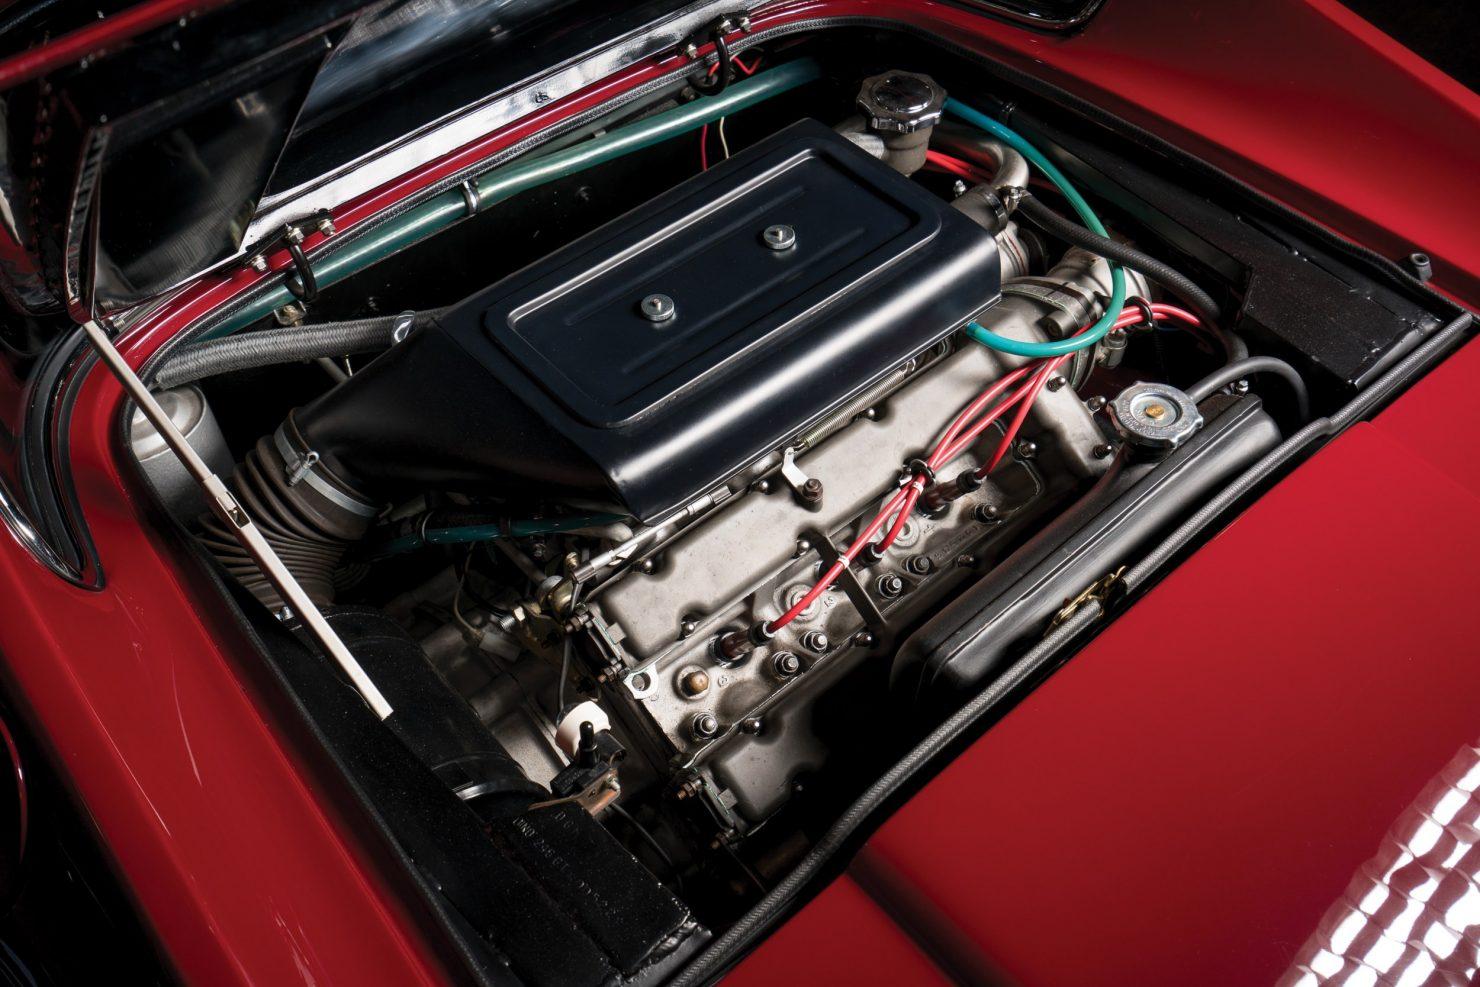 ferrari dino 246 3 1480x987 - 1969 Ferrari Dino 246 GT